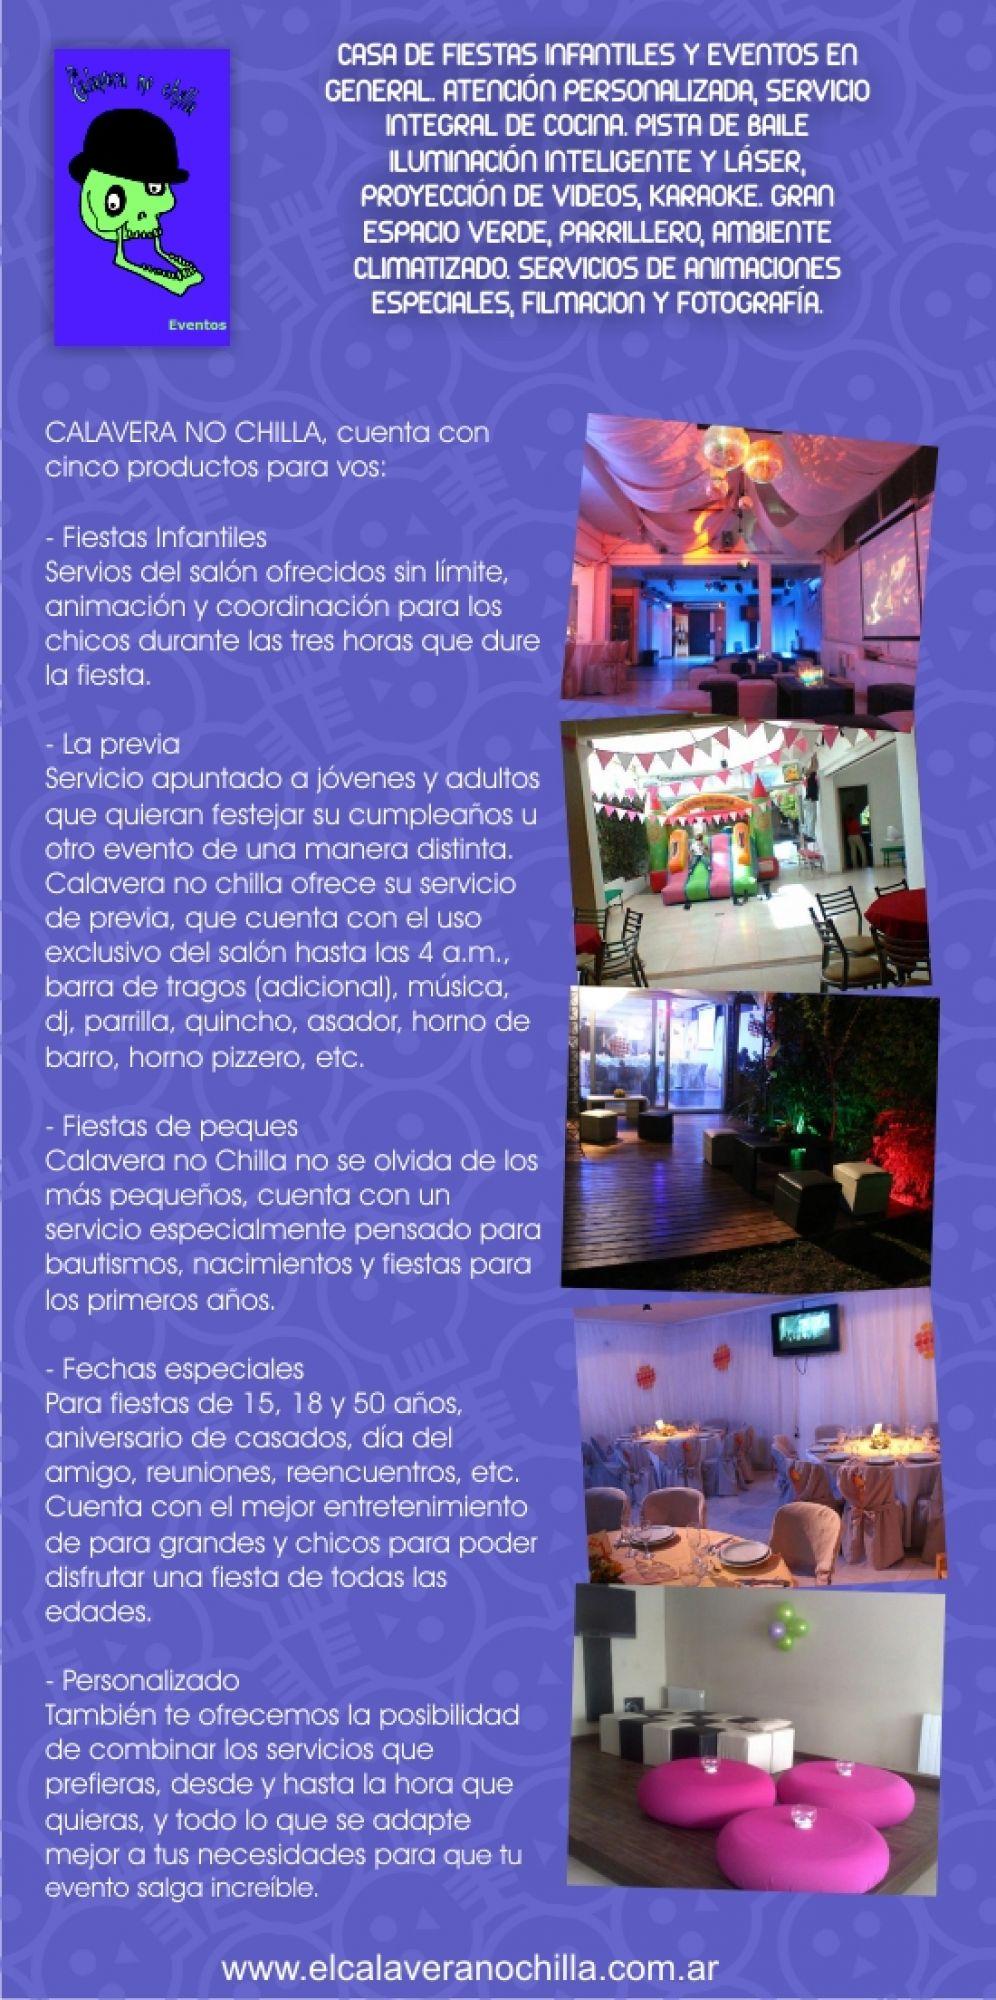 CALAVERA NO CHILLA | Fiestasparachicos.com